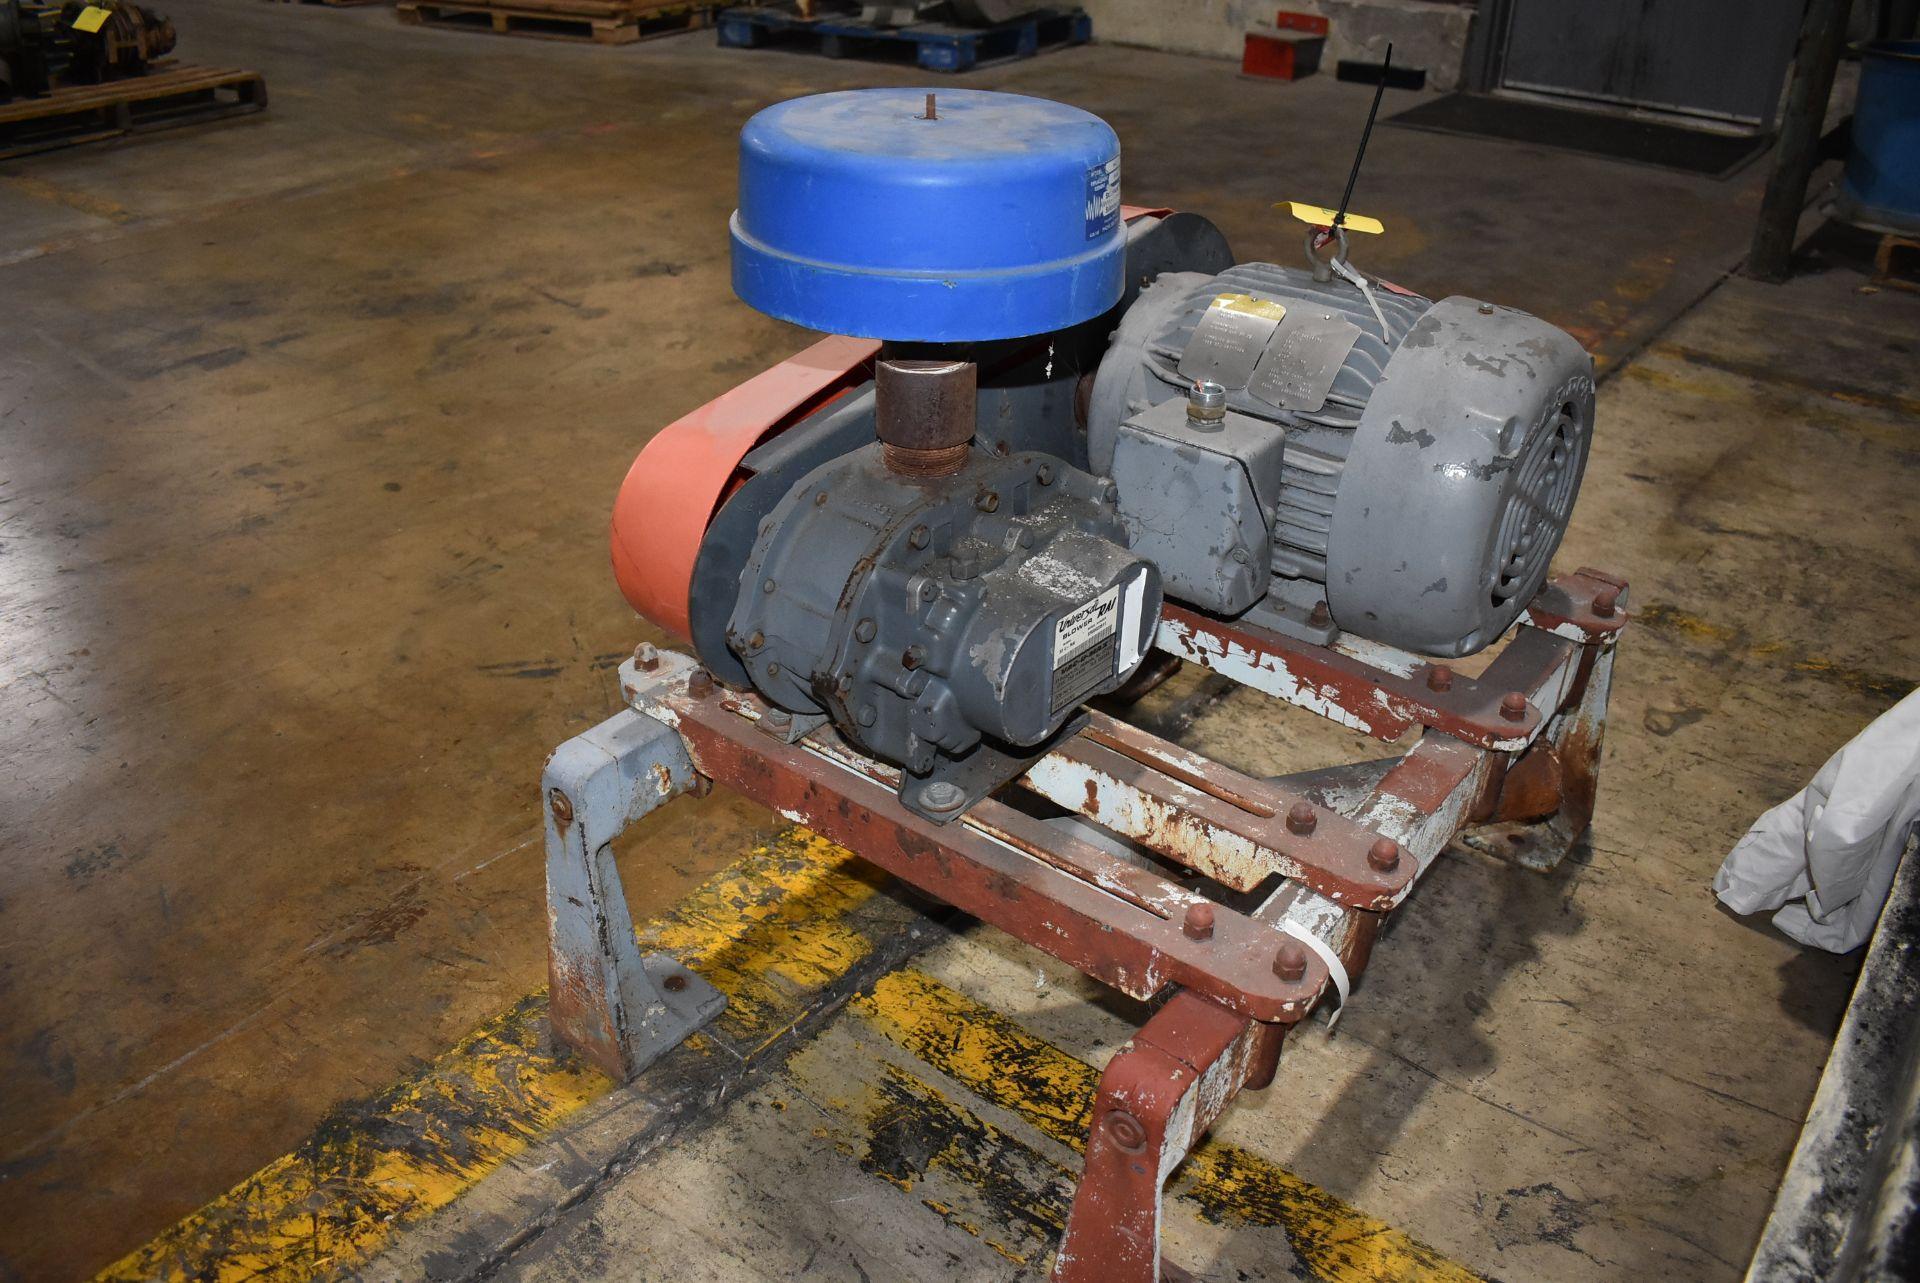 Universal Blower Model #33U-RAI, Includes Baldor 7 1/2 HP Motor - Image 3 of 3